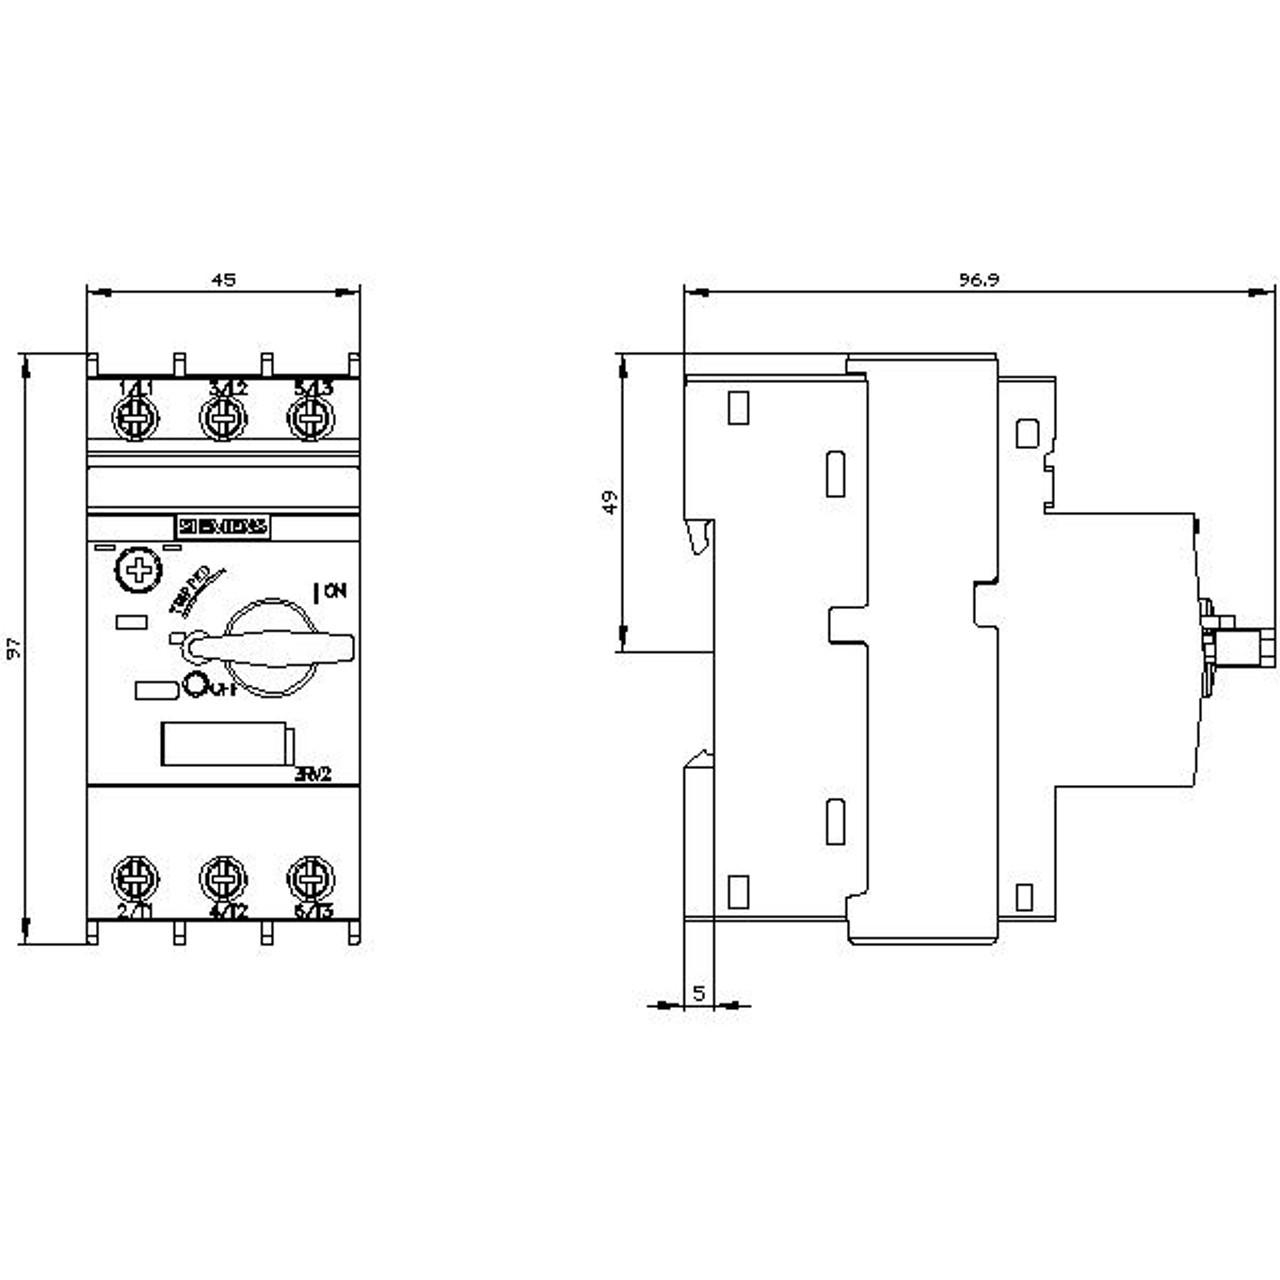 Class 10 Overload Trip Siemens Sirius 3RV20214DA10 Motor Starter Protector Screw Terminal Manual Motor Starter Size S0 18 to 25A FLA Adjustment Range